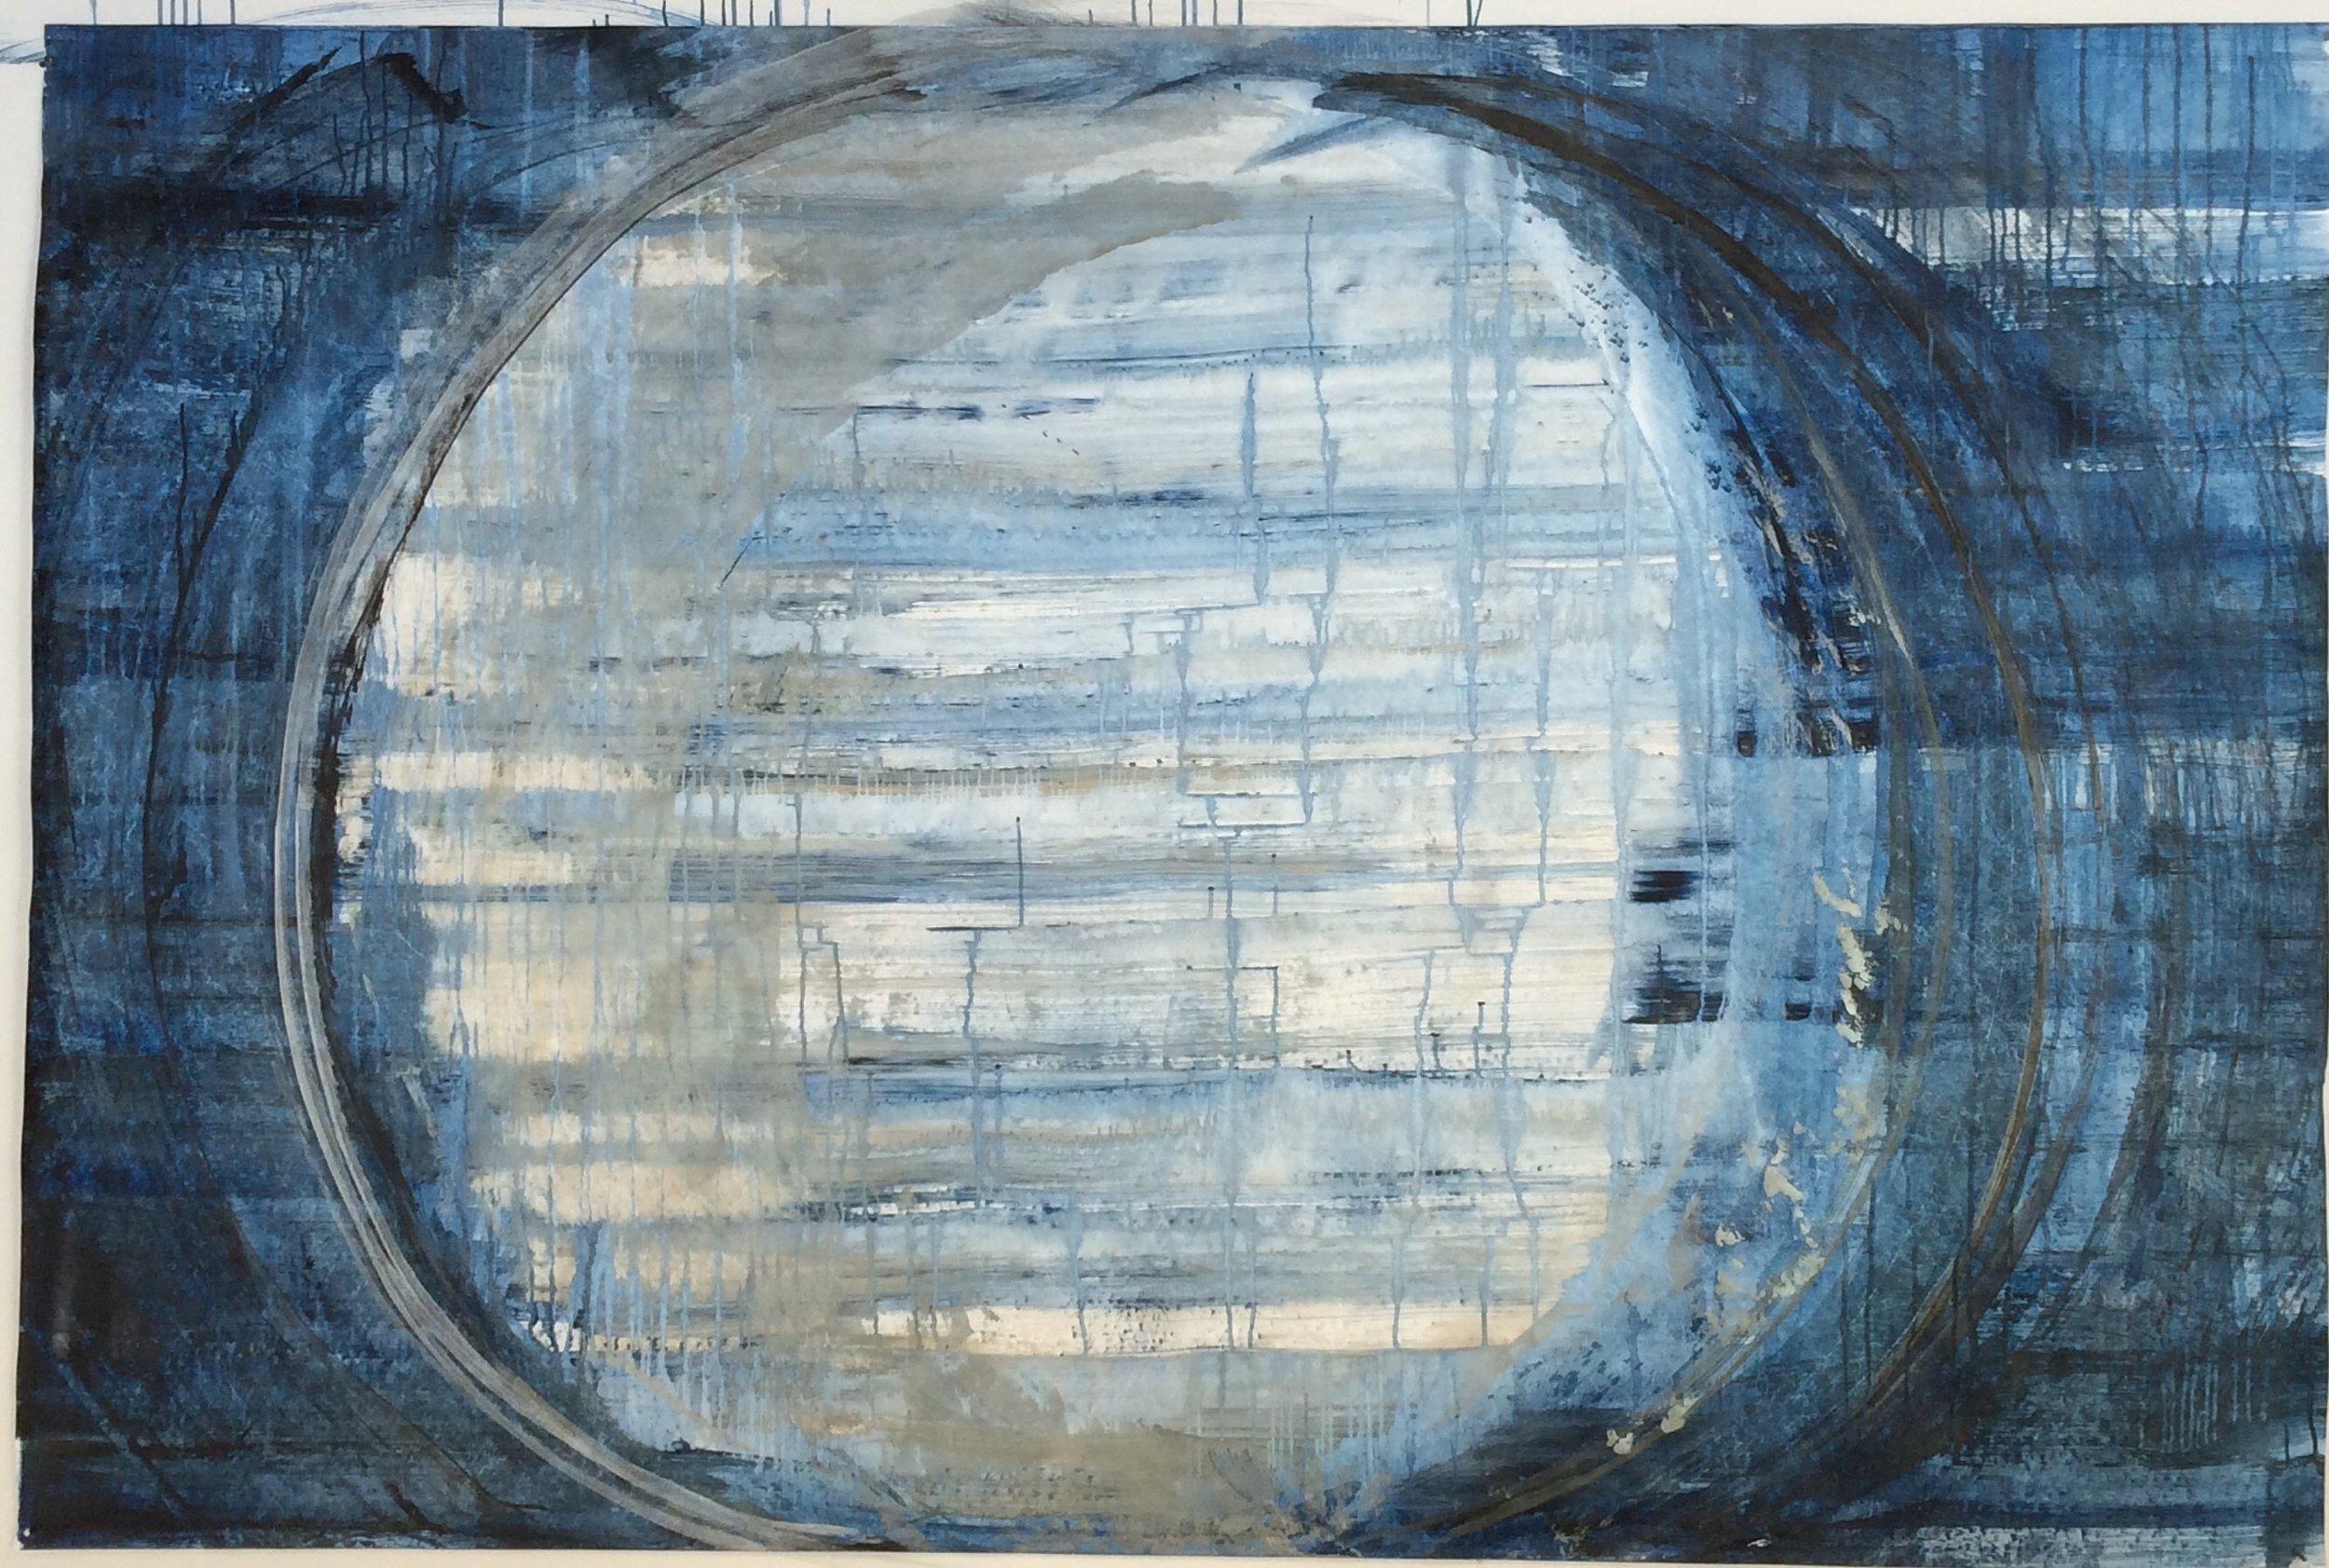 Moon and Sea;acrylic on tyvek